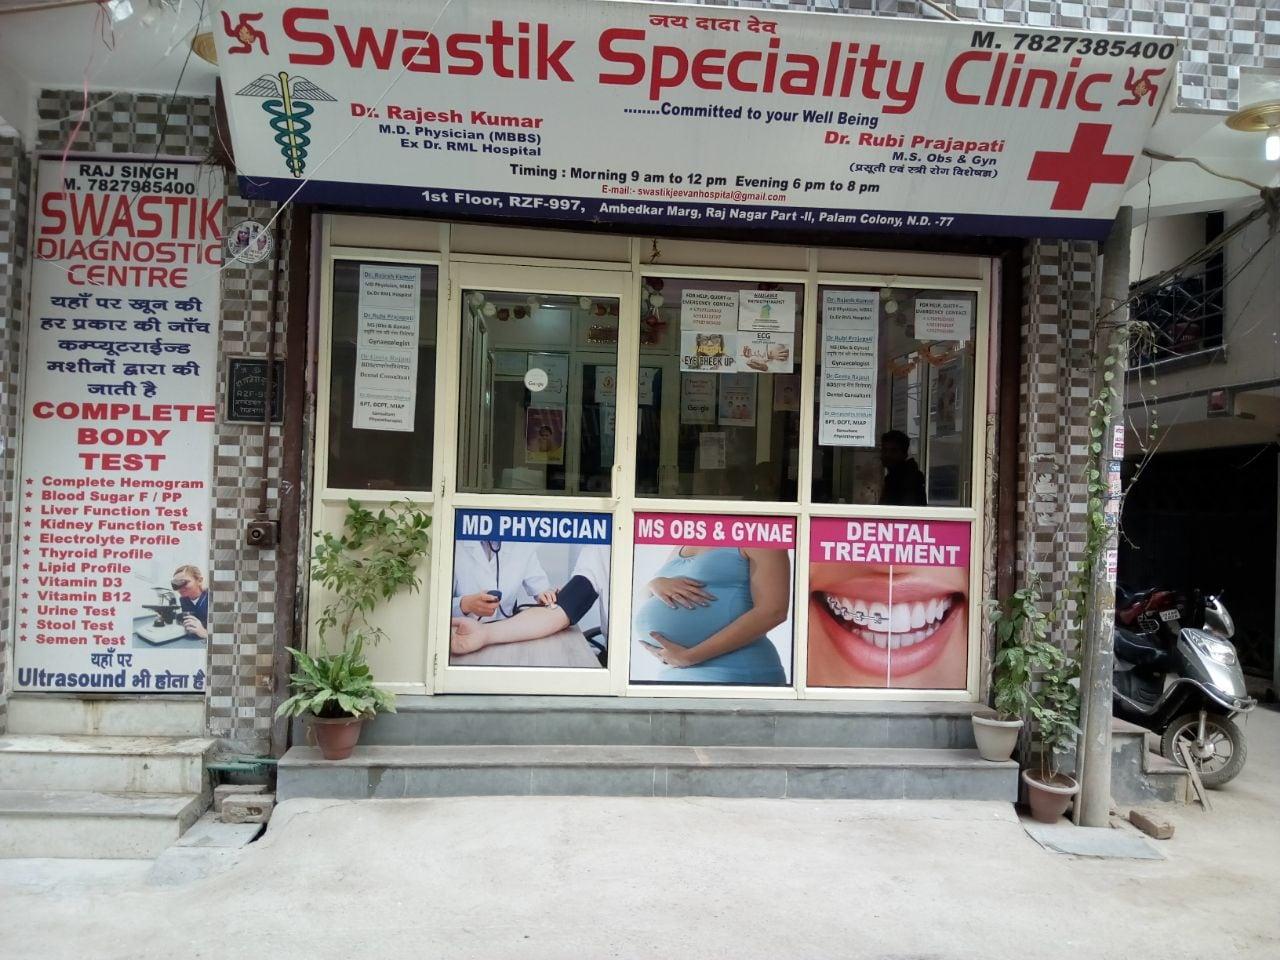 Top 50 Gynecologists in Dwarka Sector 12, Delhi - Best